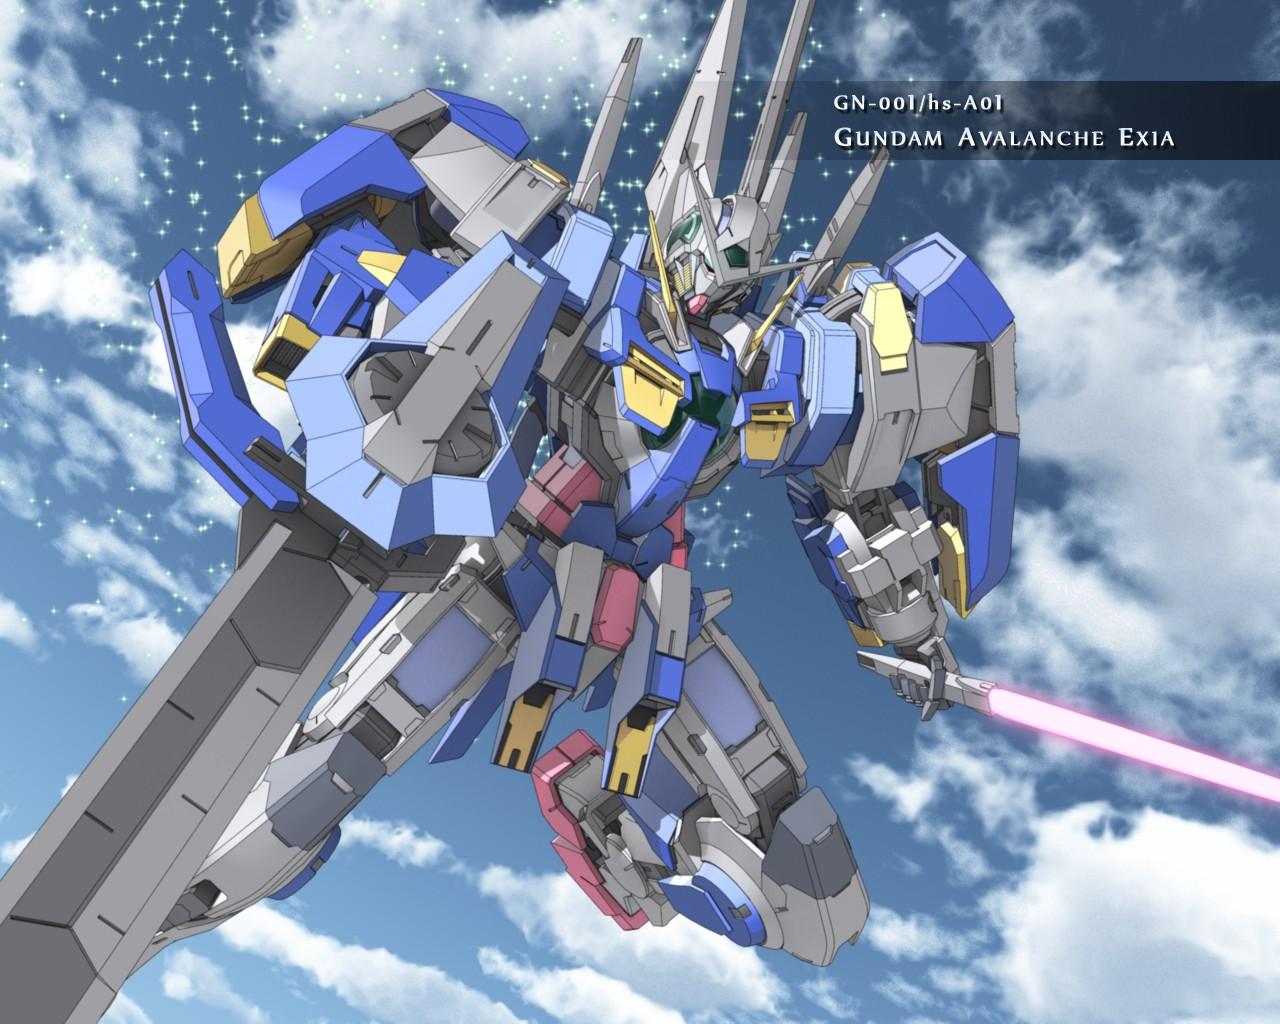 Gundam Imagens Gundam Avalanche Exia Hd Wallpaper And Background